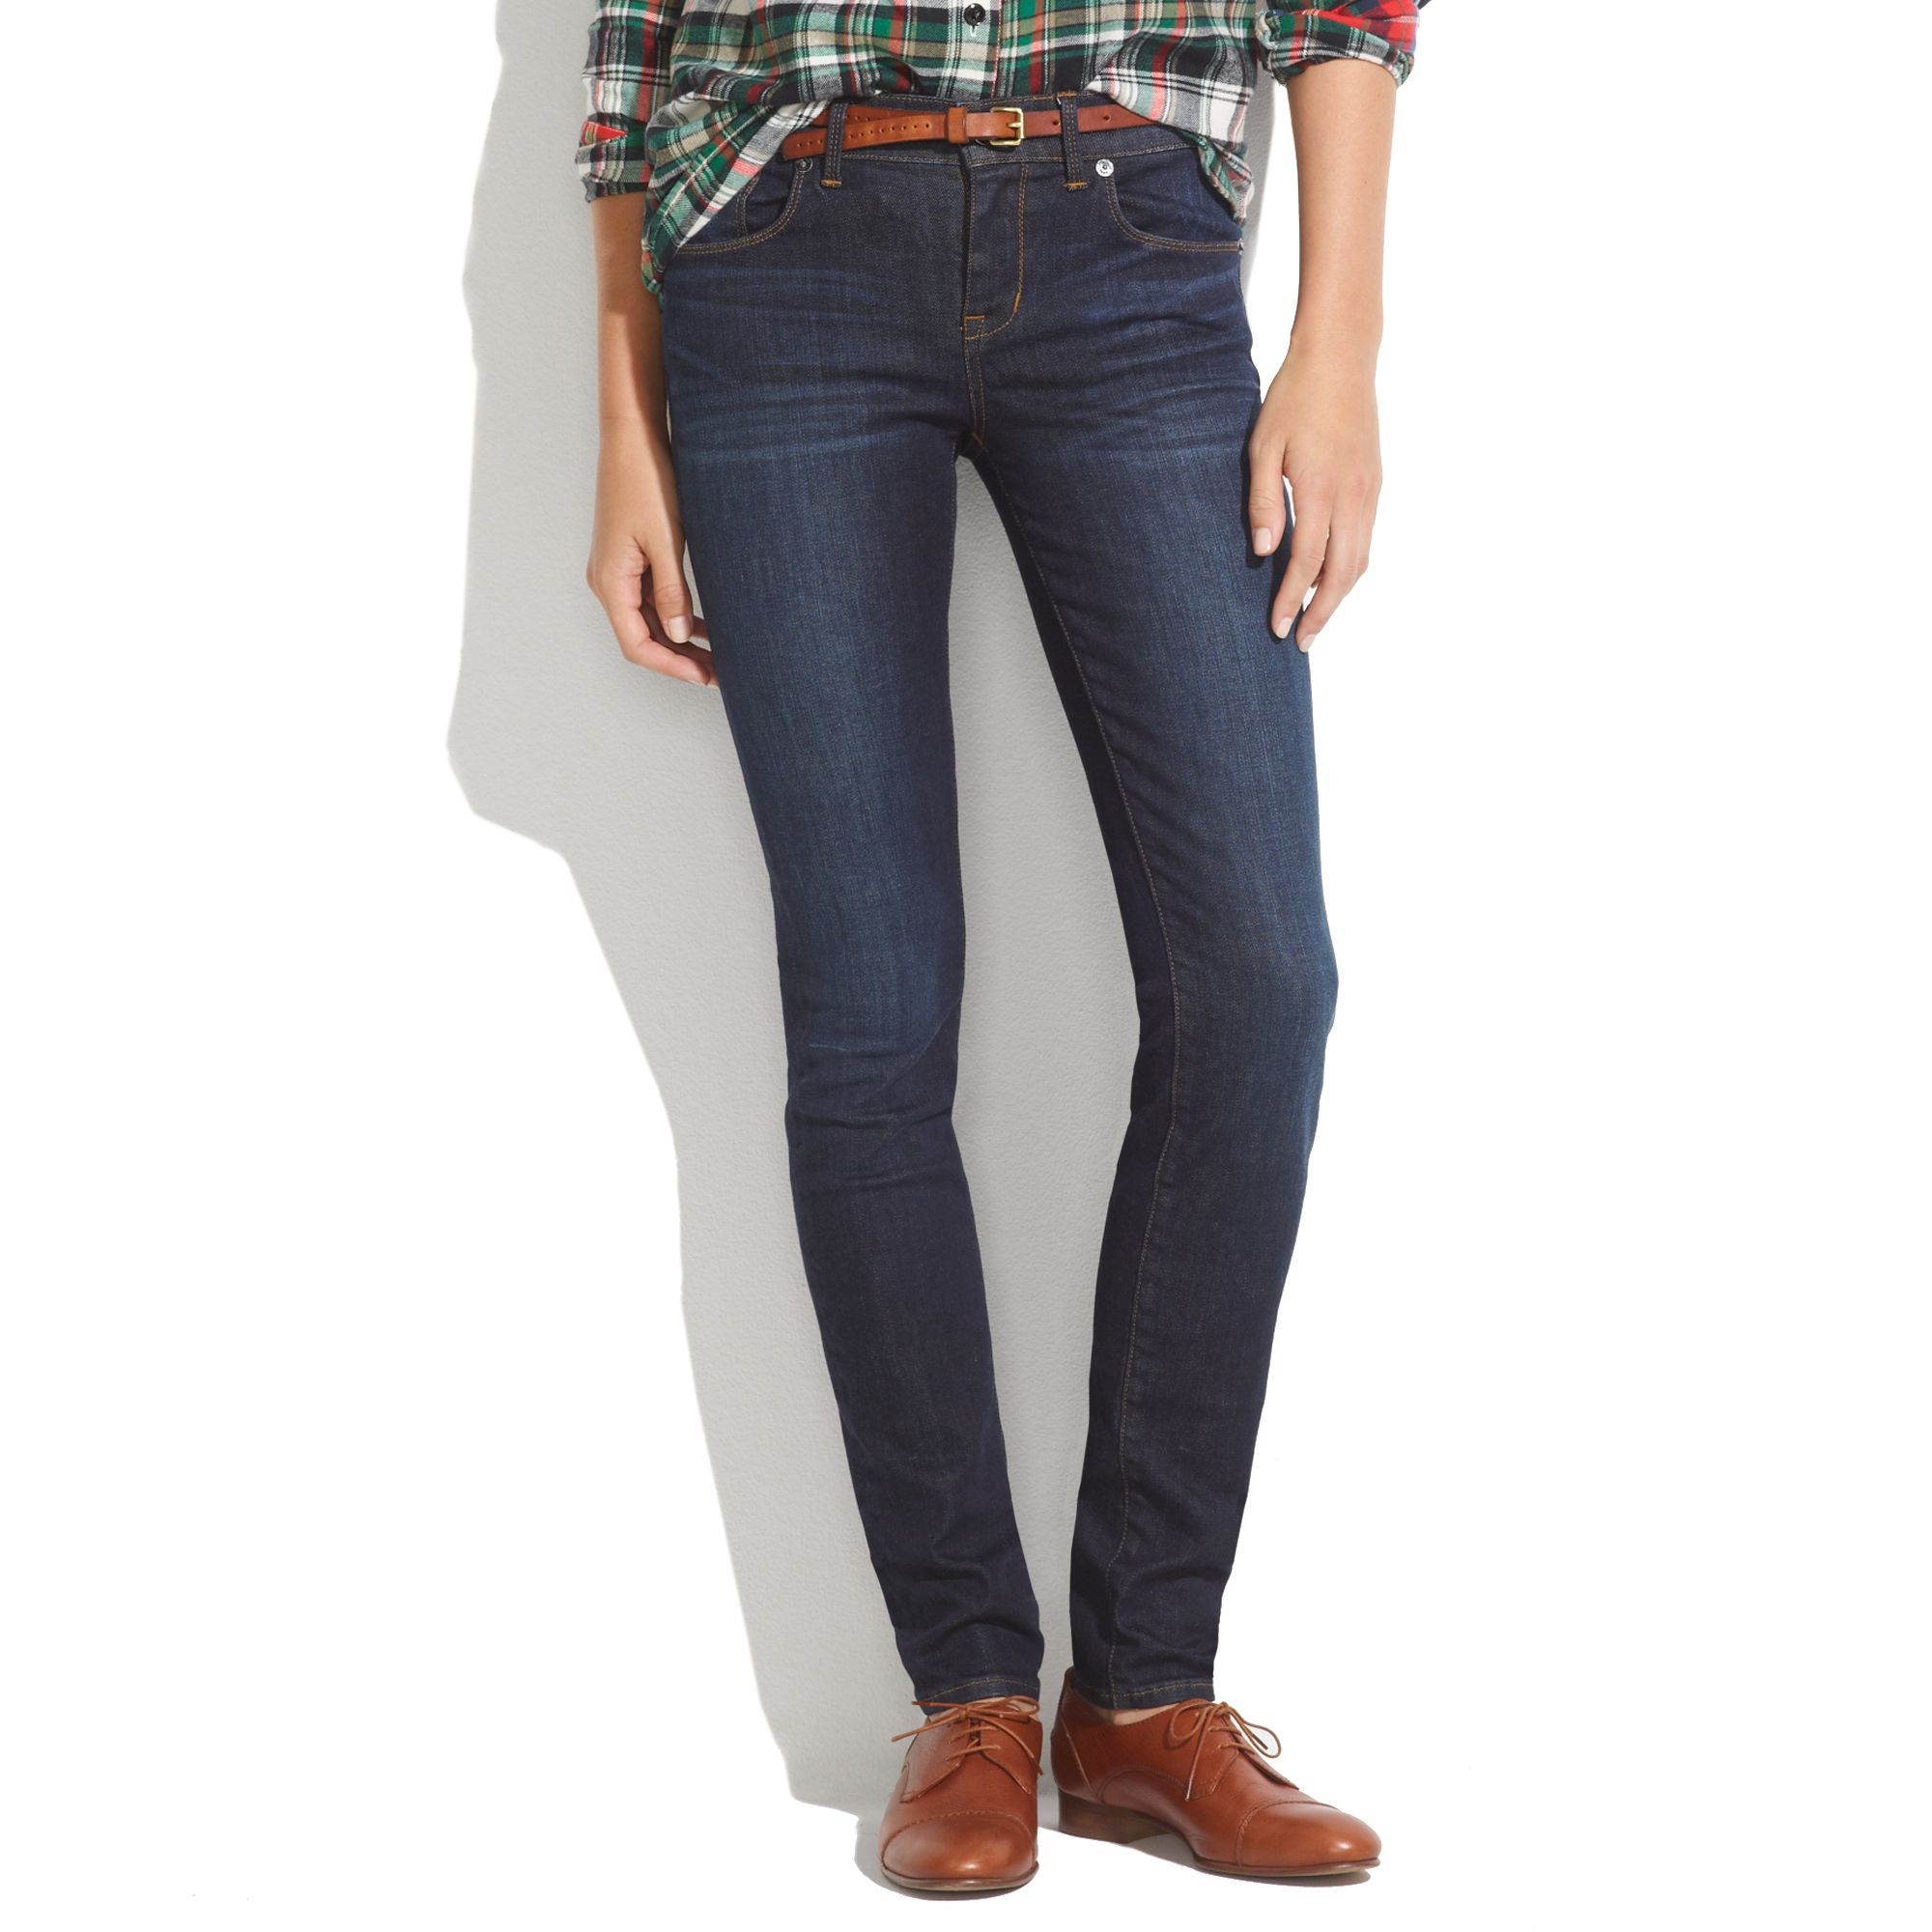 Joes Jeans For Women